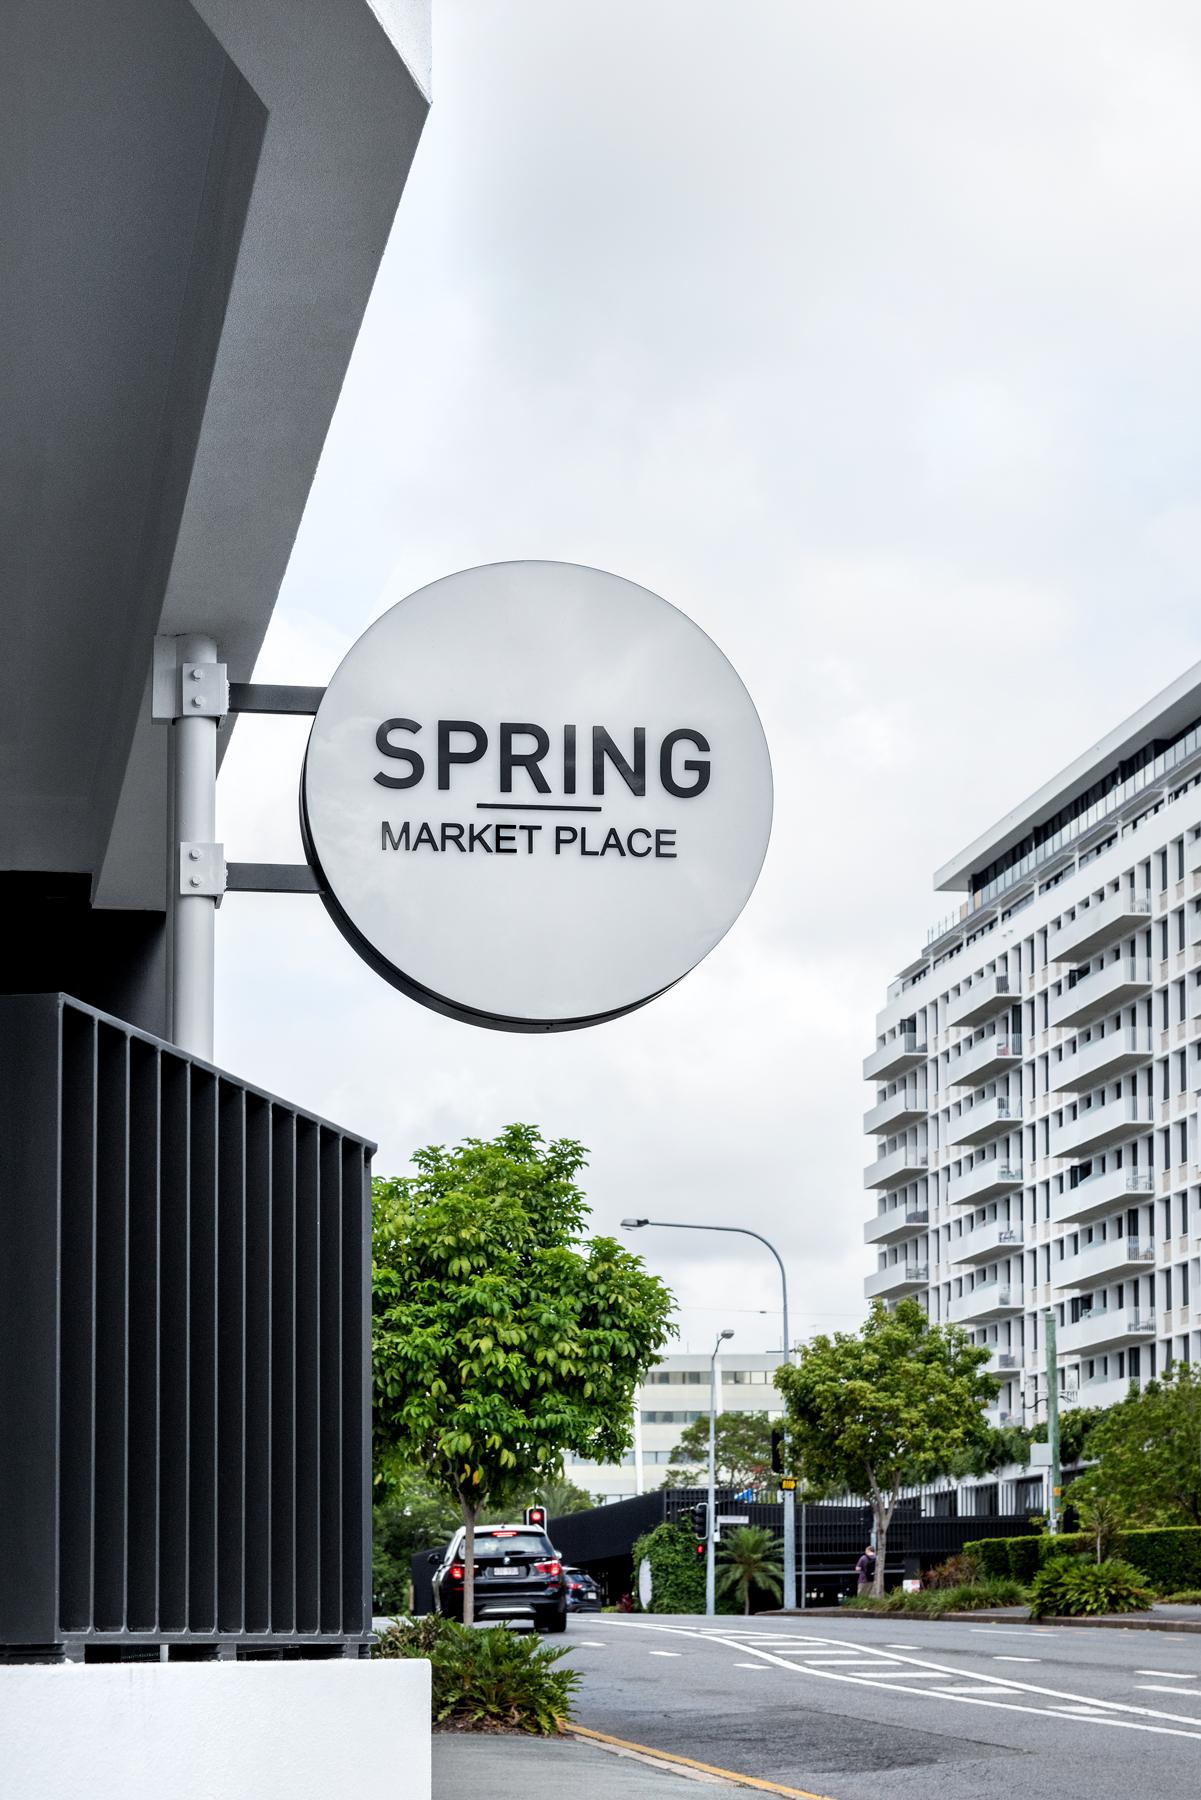 2018.12.09_MYE_SpringMarketPlace_15_S.jpg